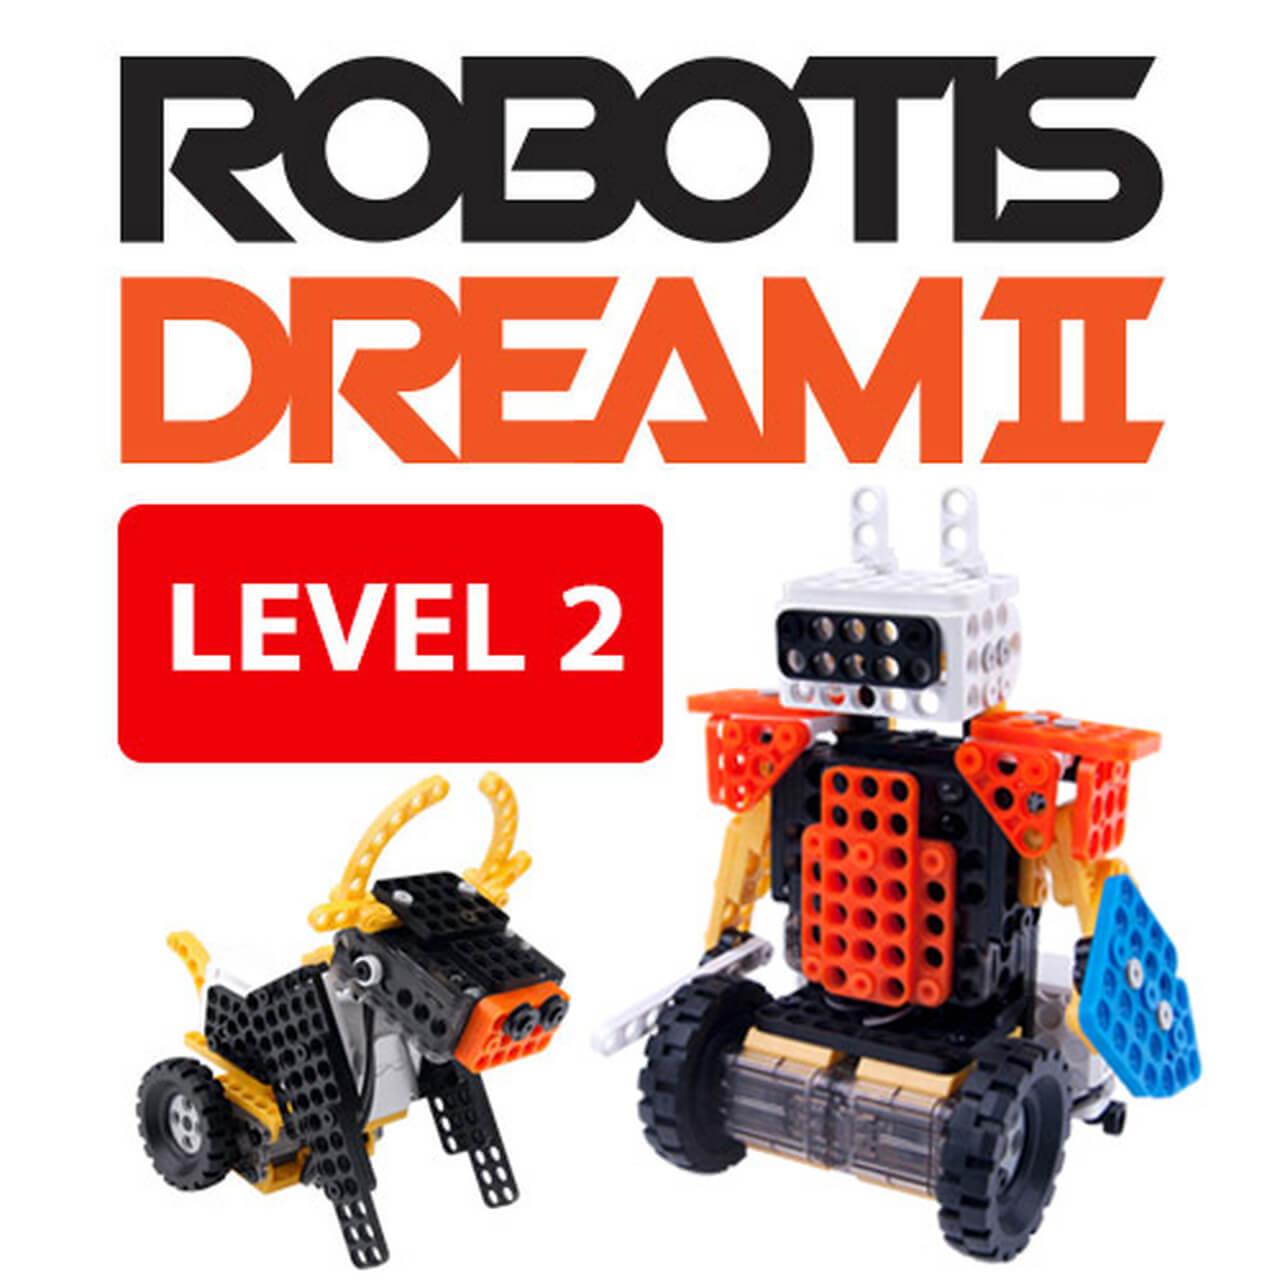 ROBOTIS-DREAM-Level-2-eğitim-seti.jpg (278 KB)